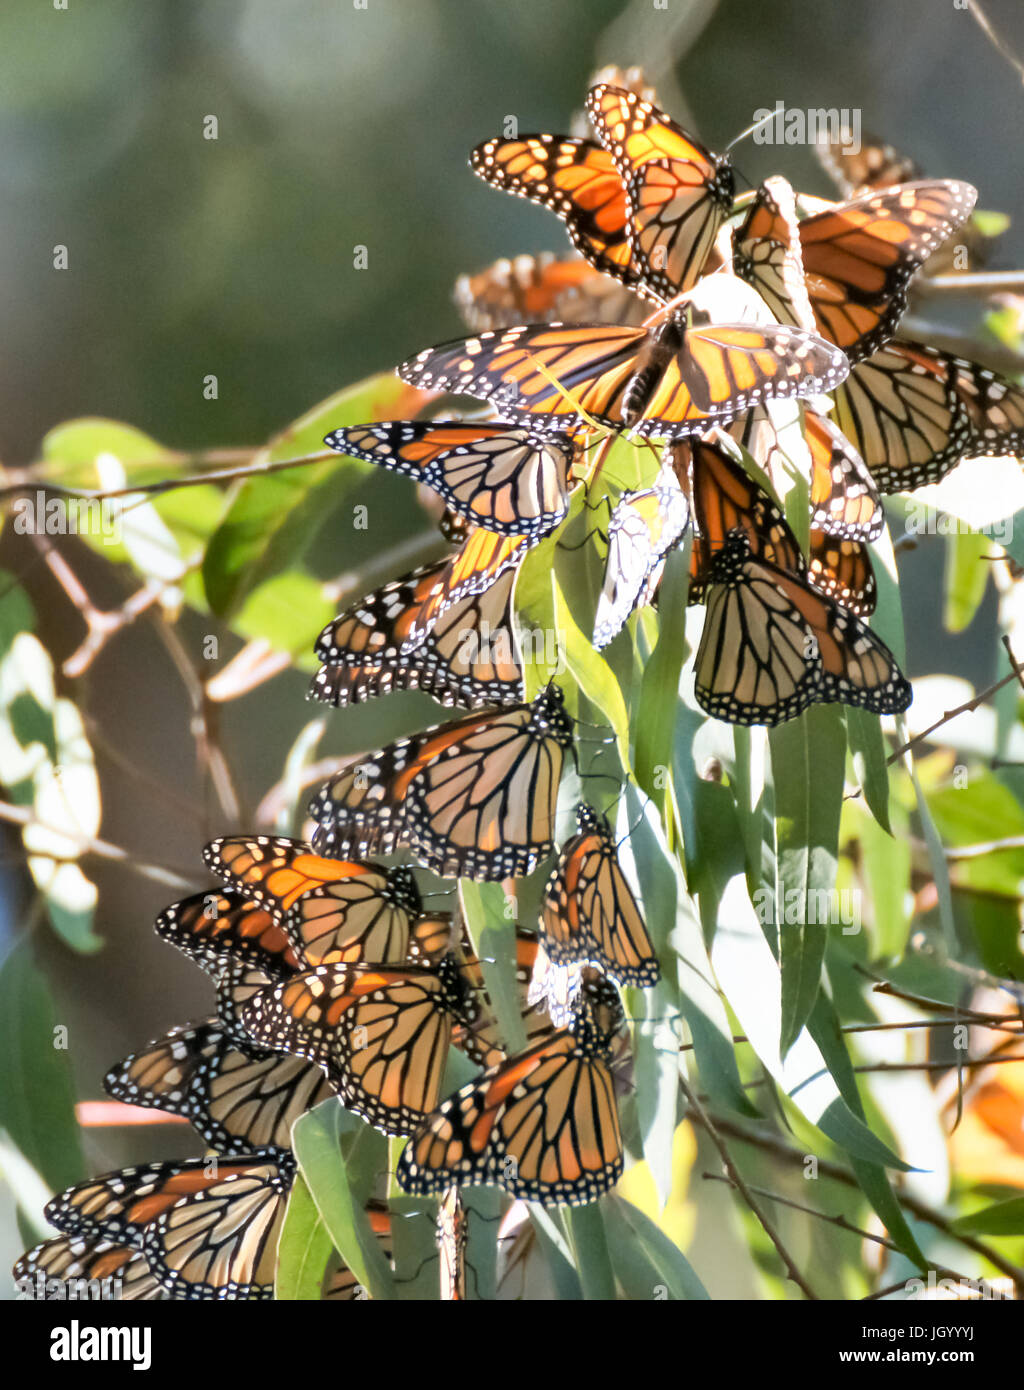 Monarch Butterfly (Danaus plexippus) Cluster - Stock Image